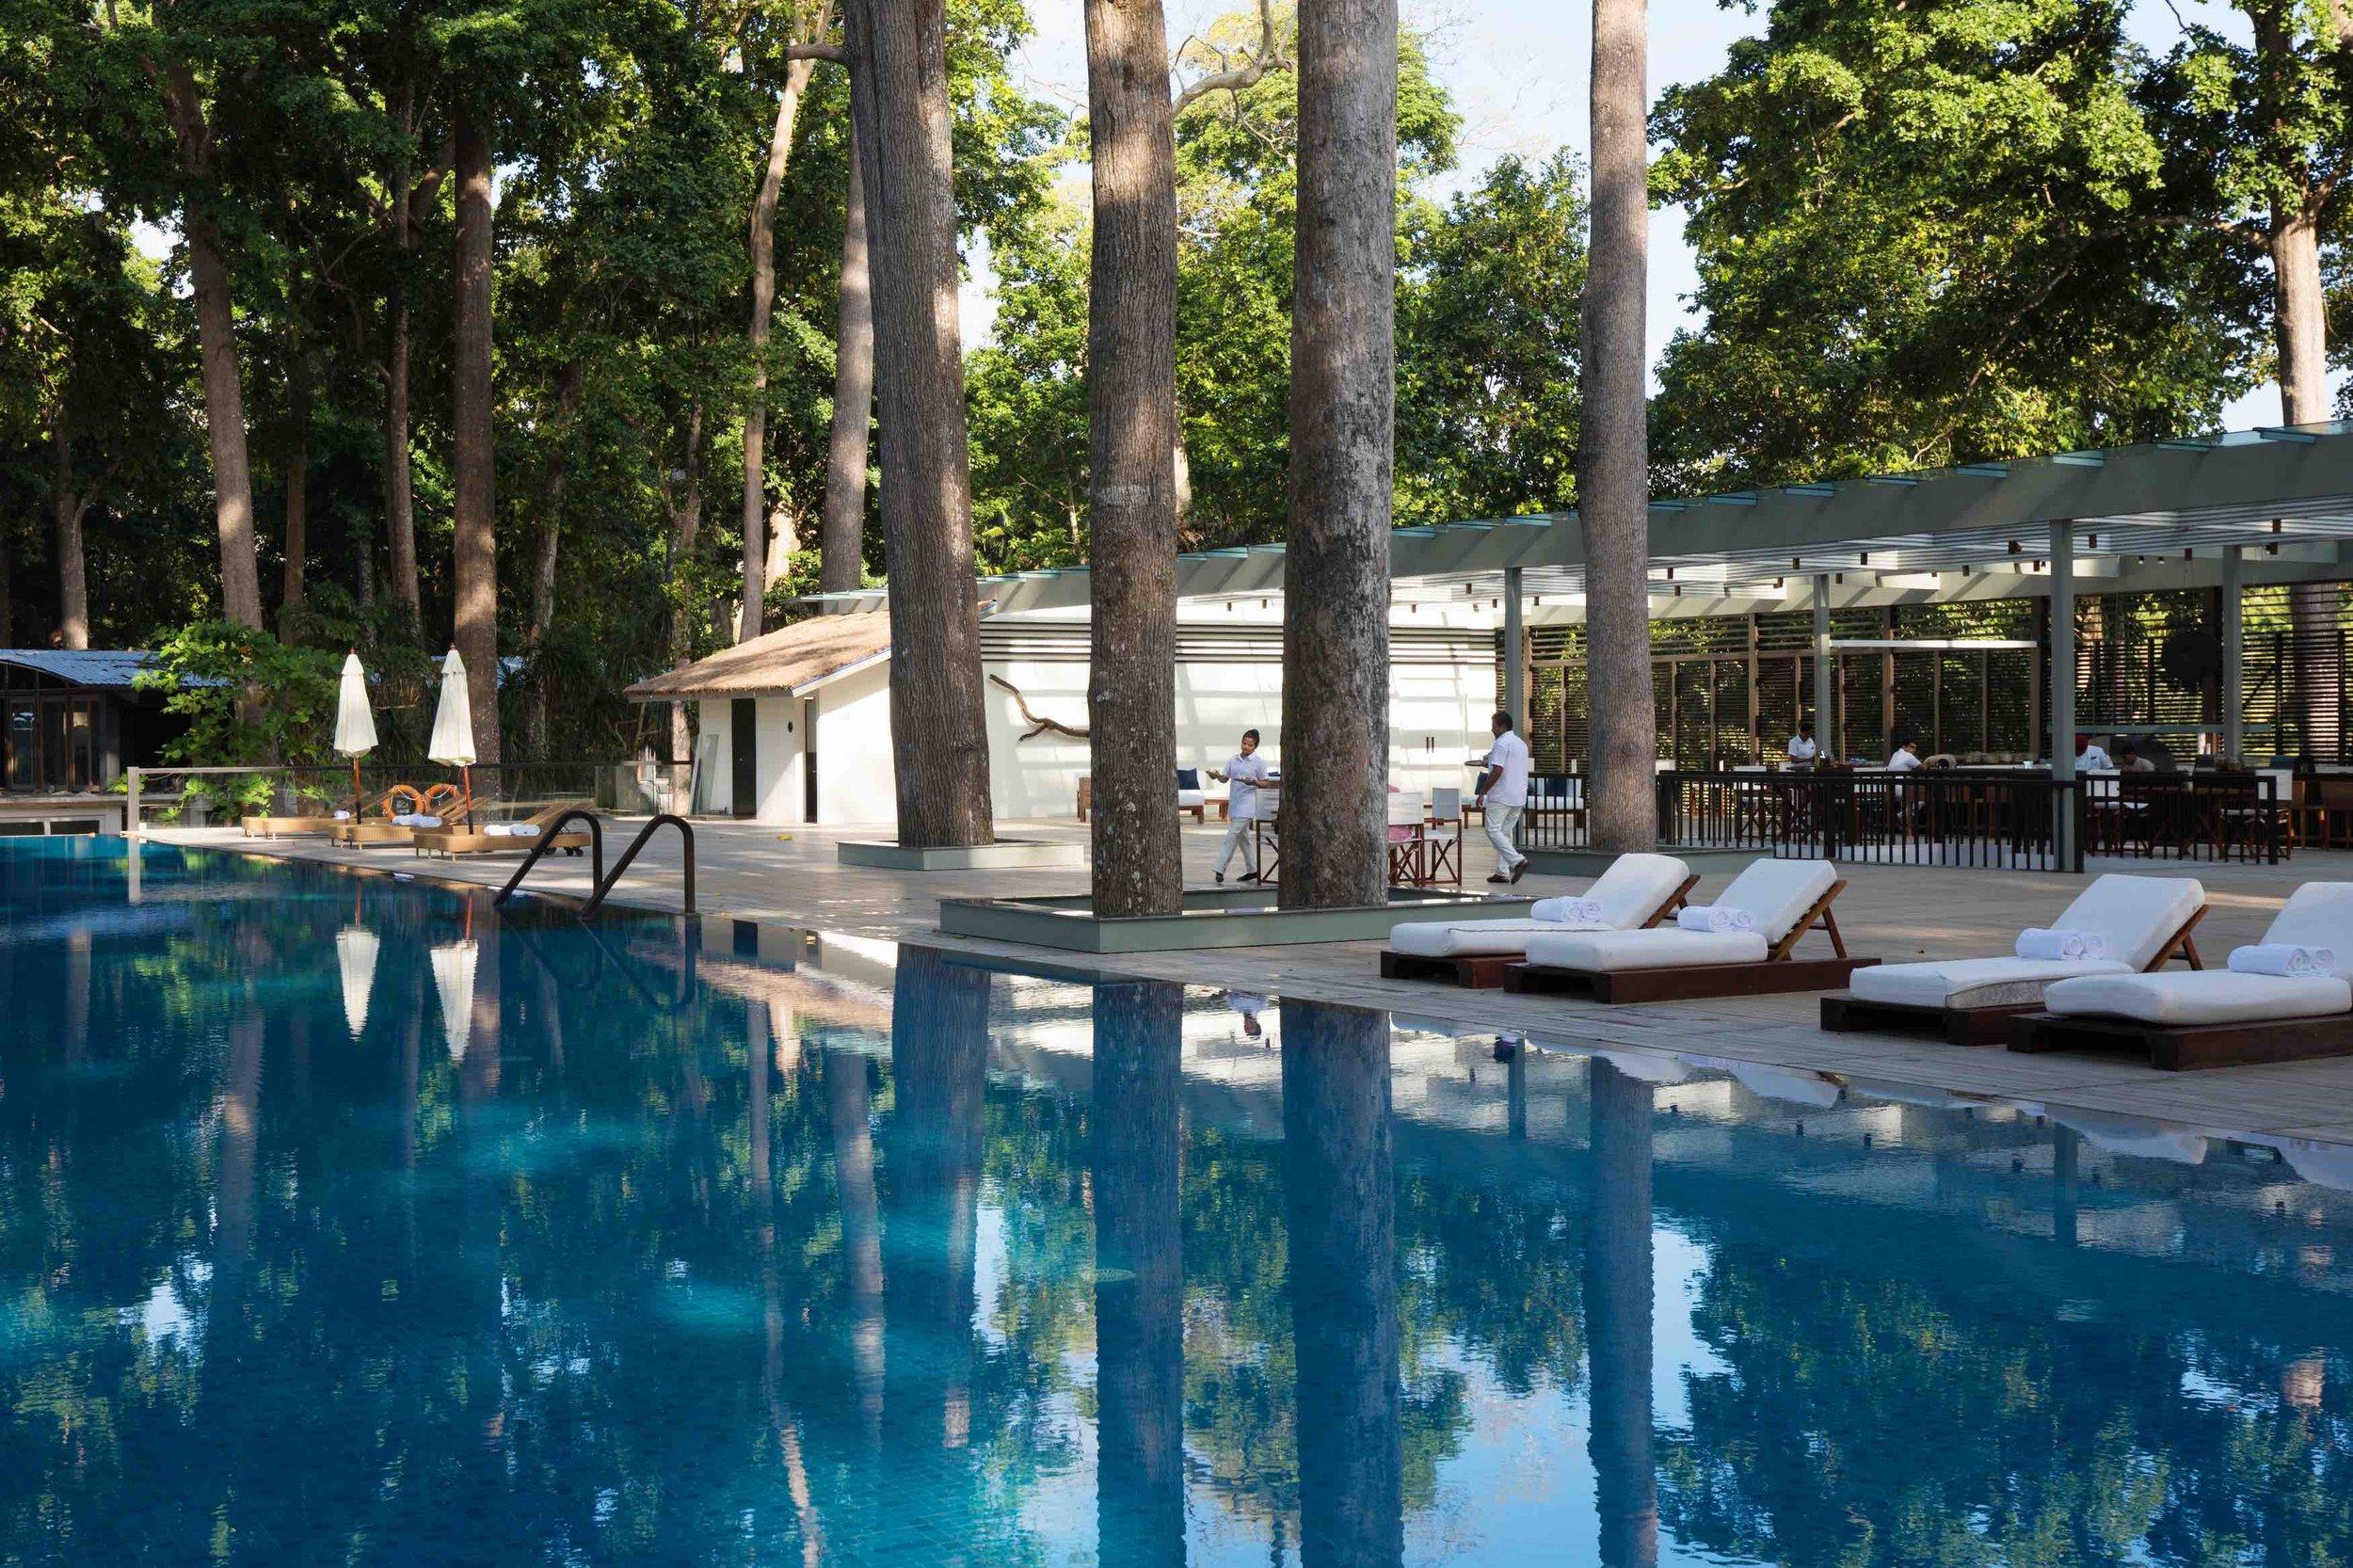 TAJ EXOTICA HOTEL HAVELOCK ISLAND ANDAMANS  INDIA-4105.jpg